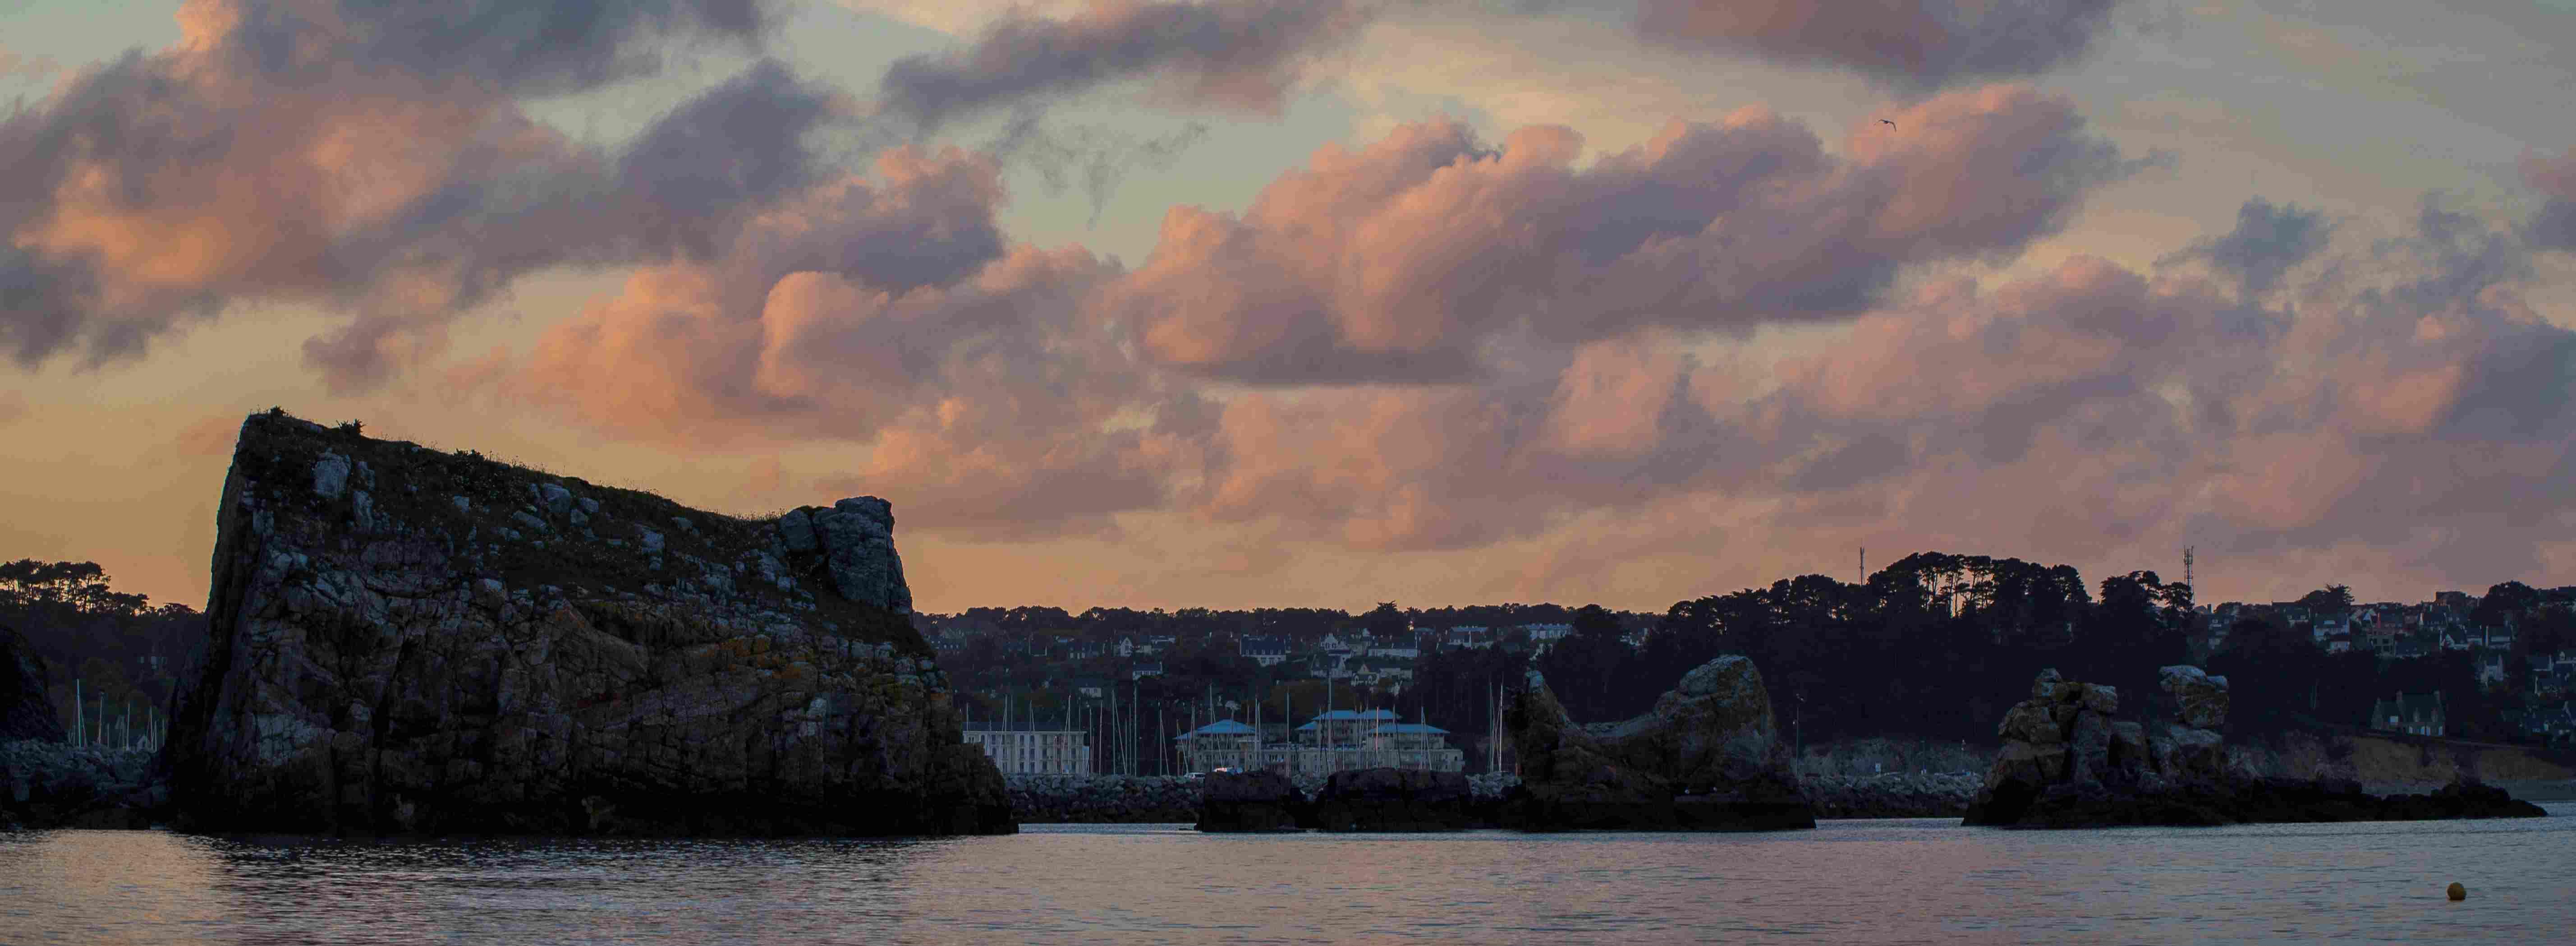 Escale de Noël : la Presqu'île de Crozon